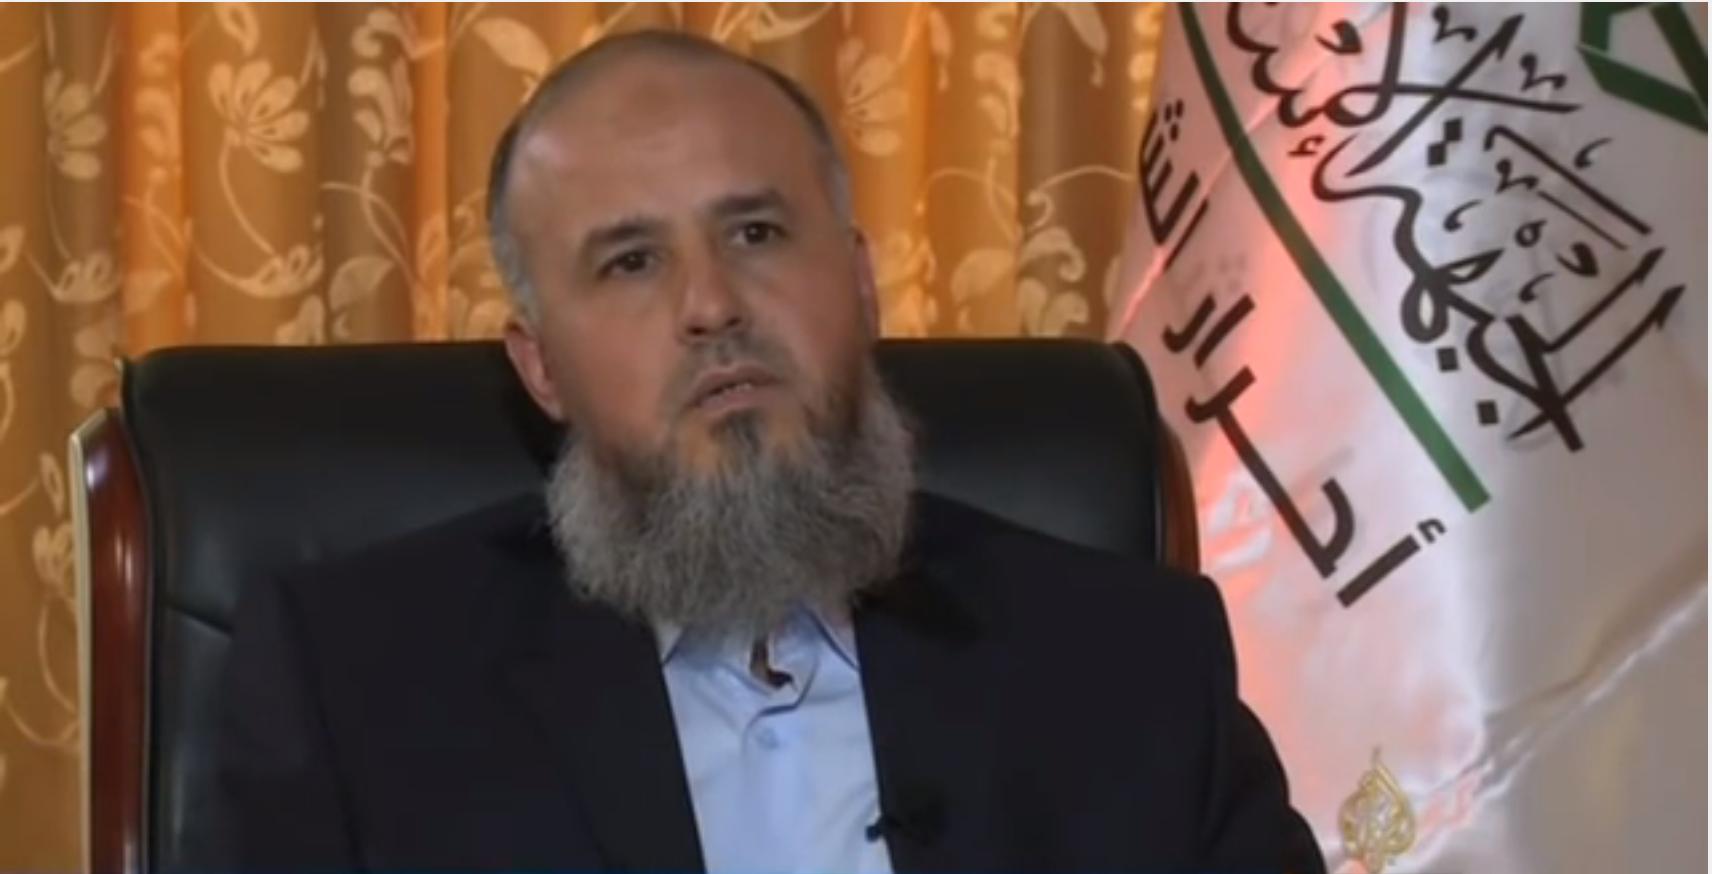 Aleppo-based rebel groups reportedly unite behind Ahrar al Sham's ...